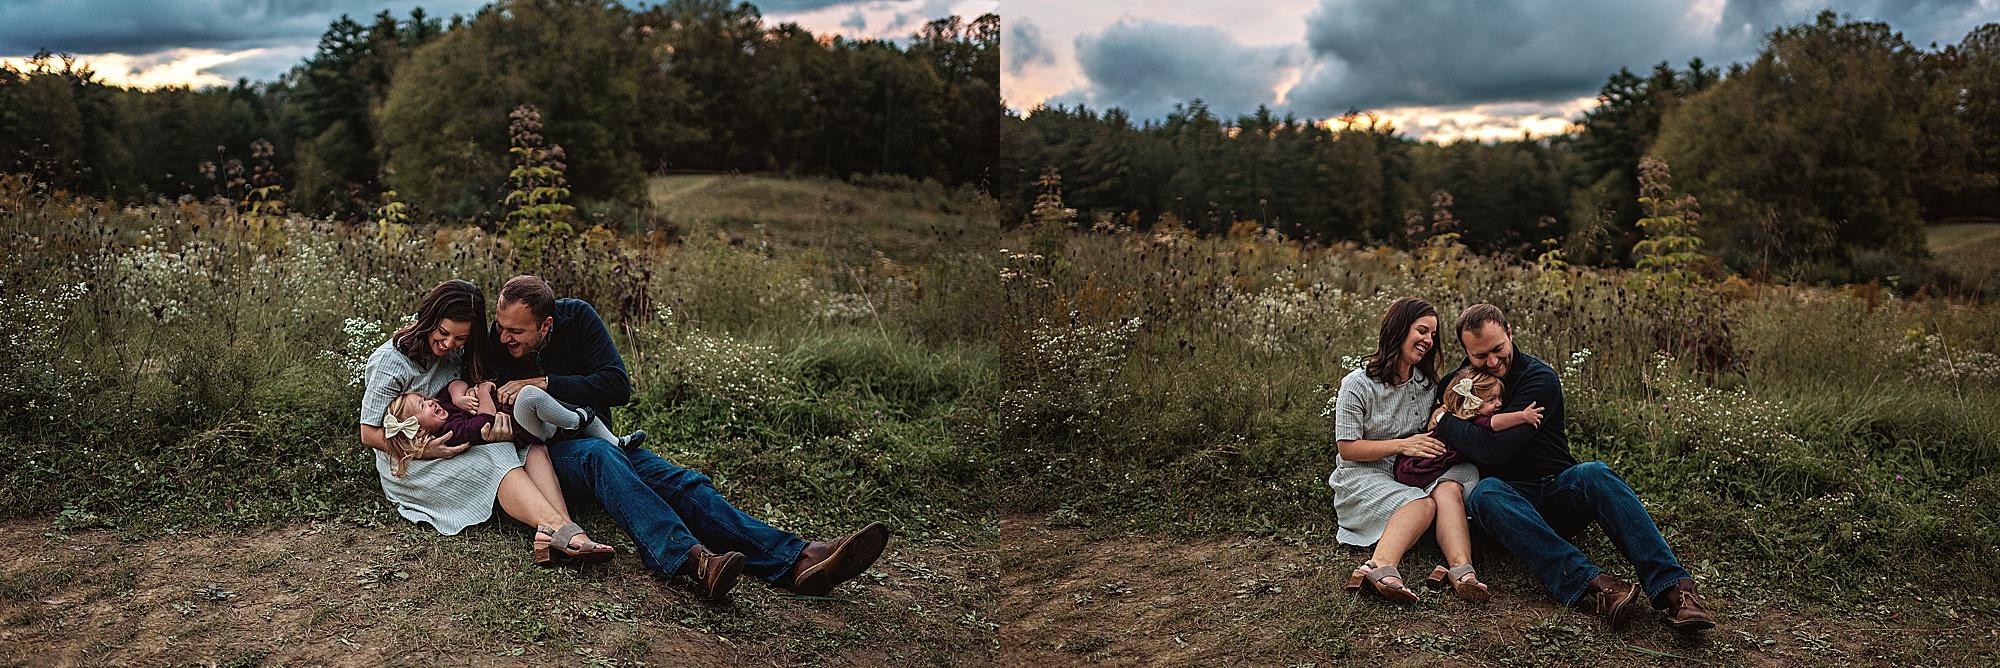 lauren-grayson-photography-akron-ohio-maternity-session-fall-hammer_0052.jpg